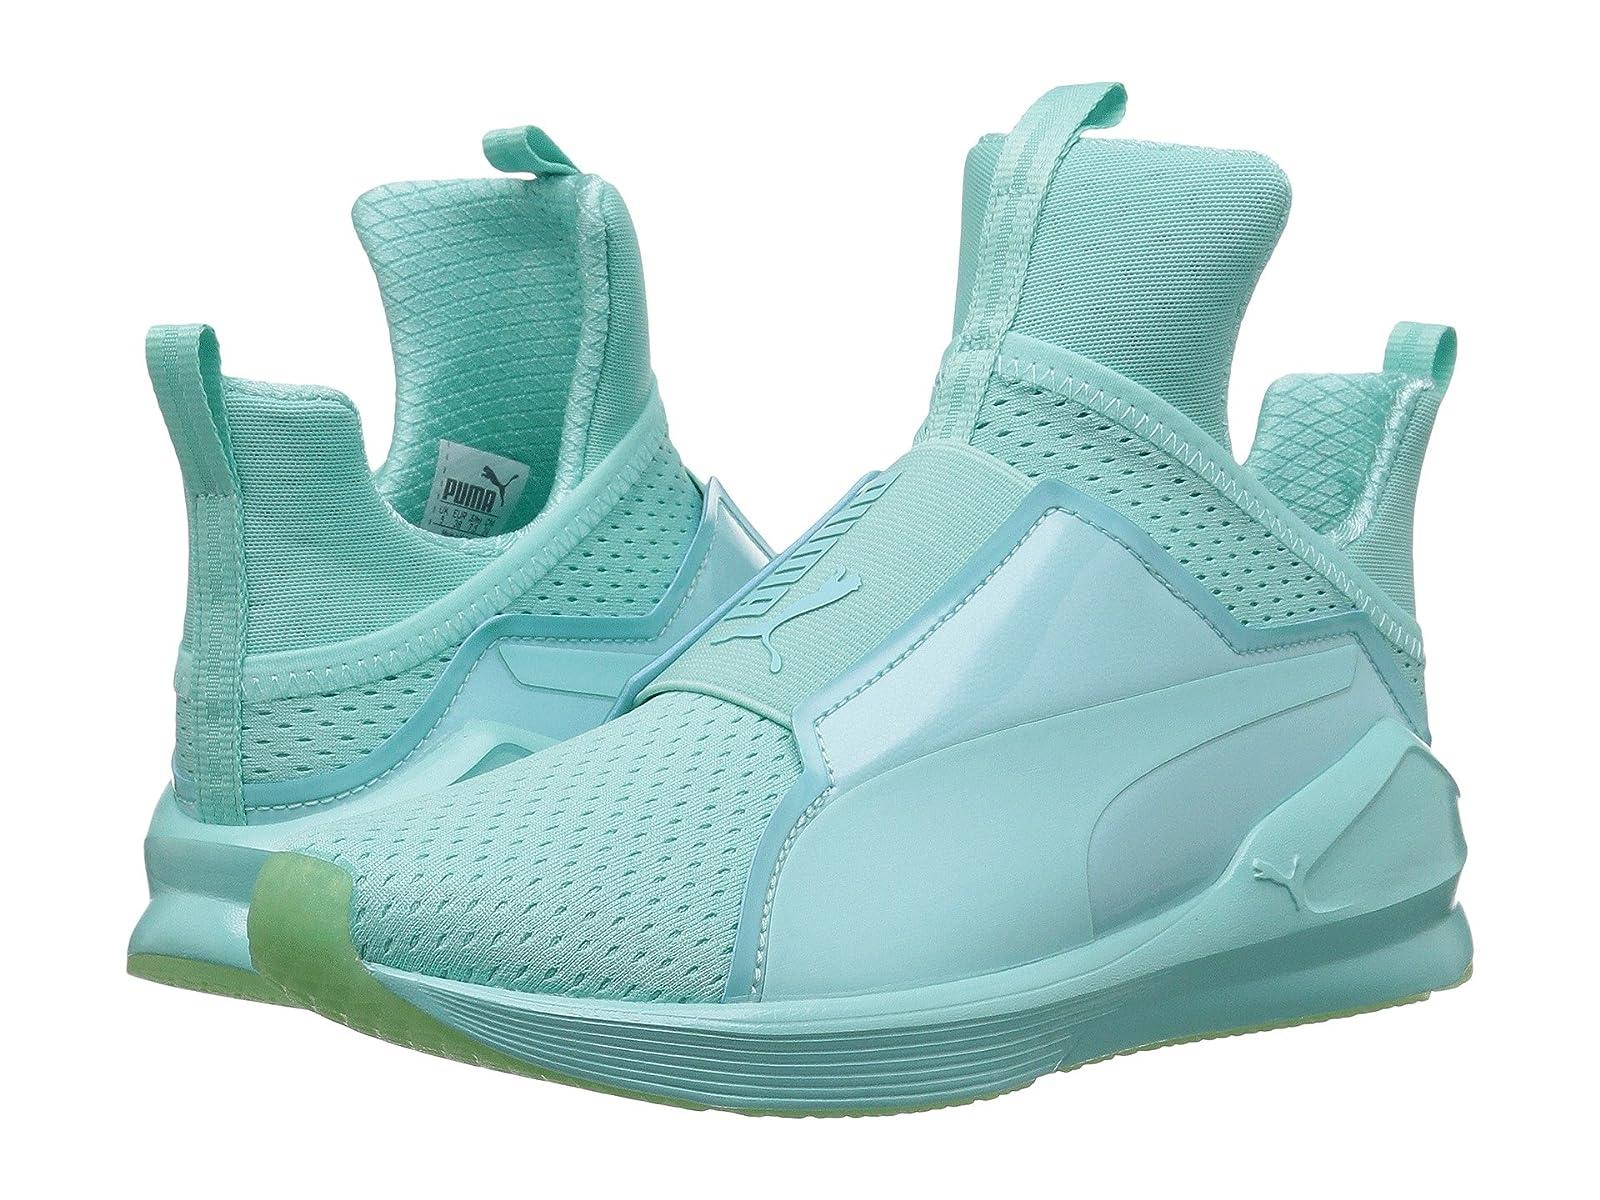 PUMA Fierce Bright MeshCheap and distinctive eye-catching shoes